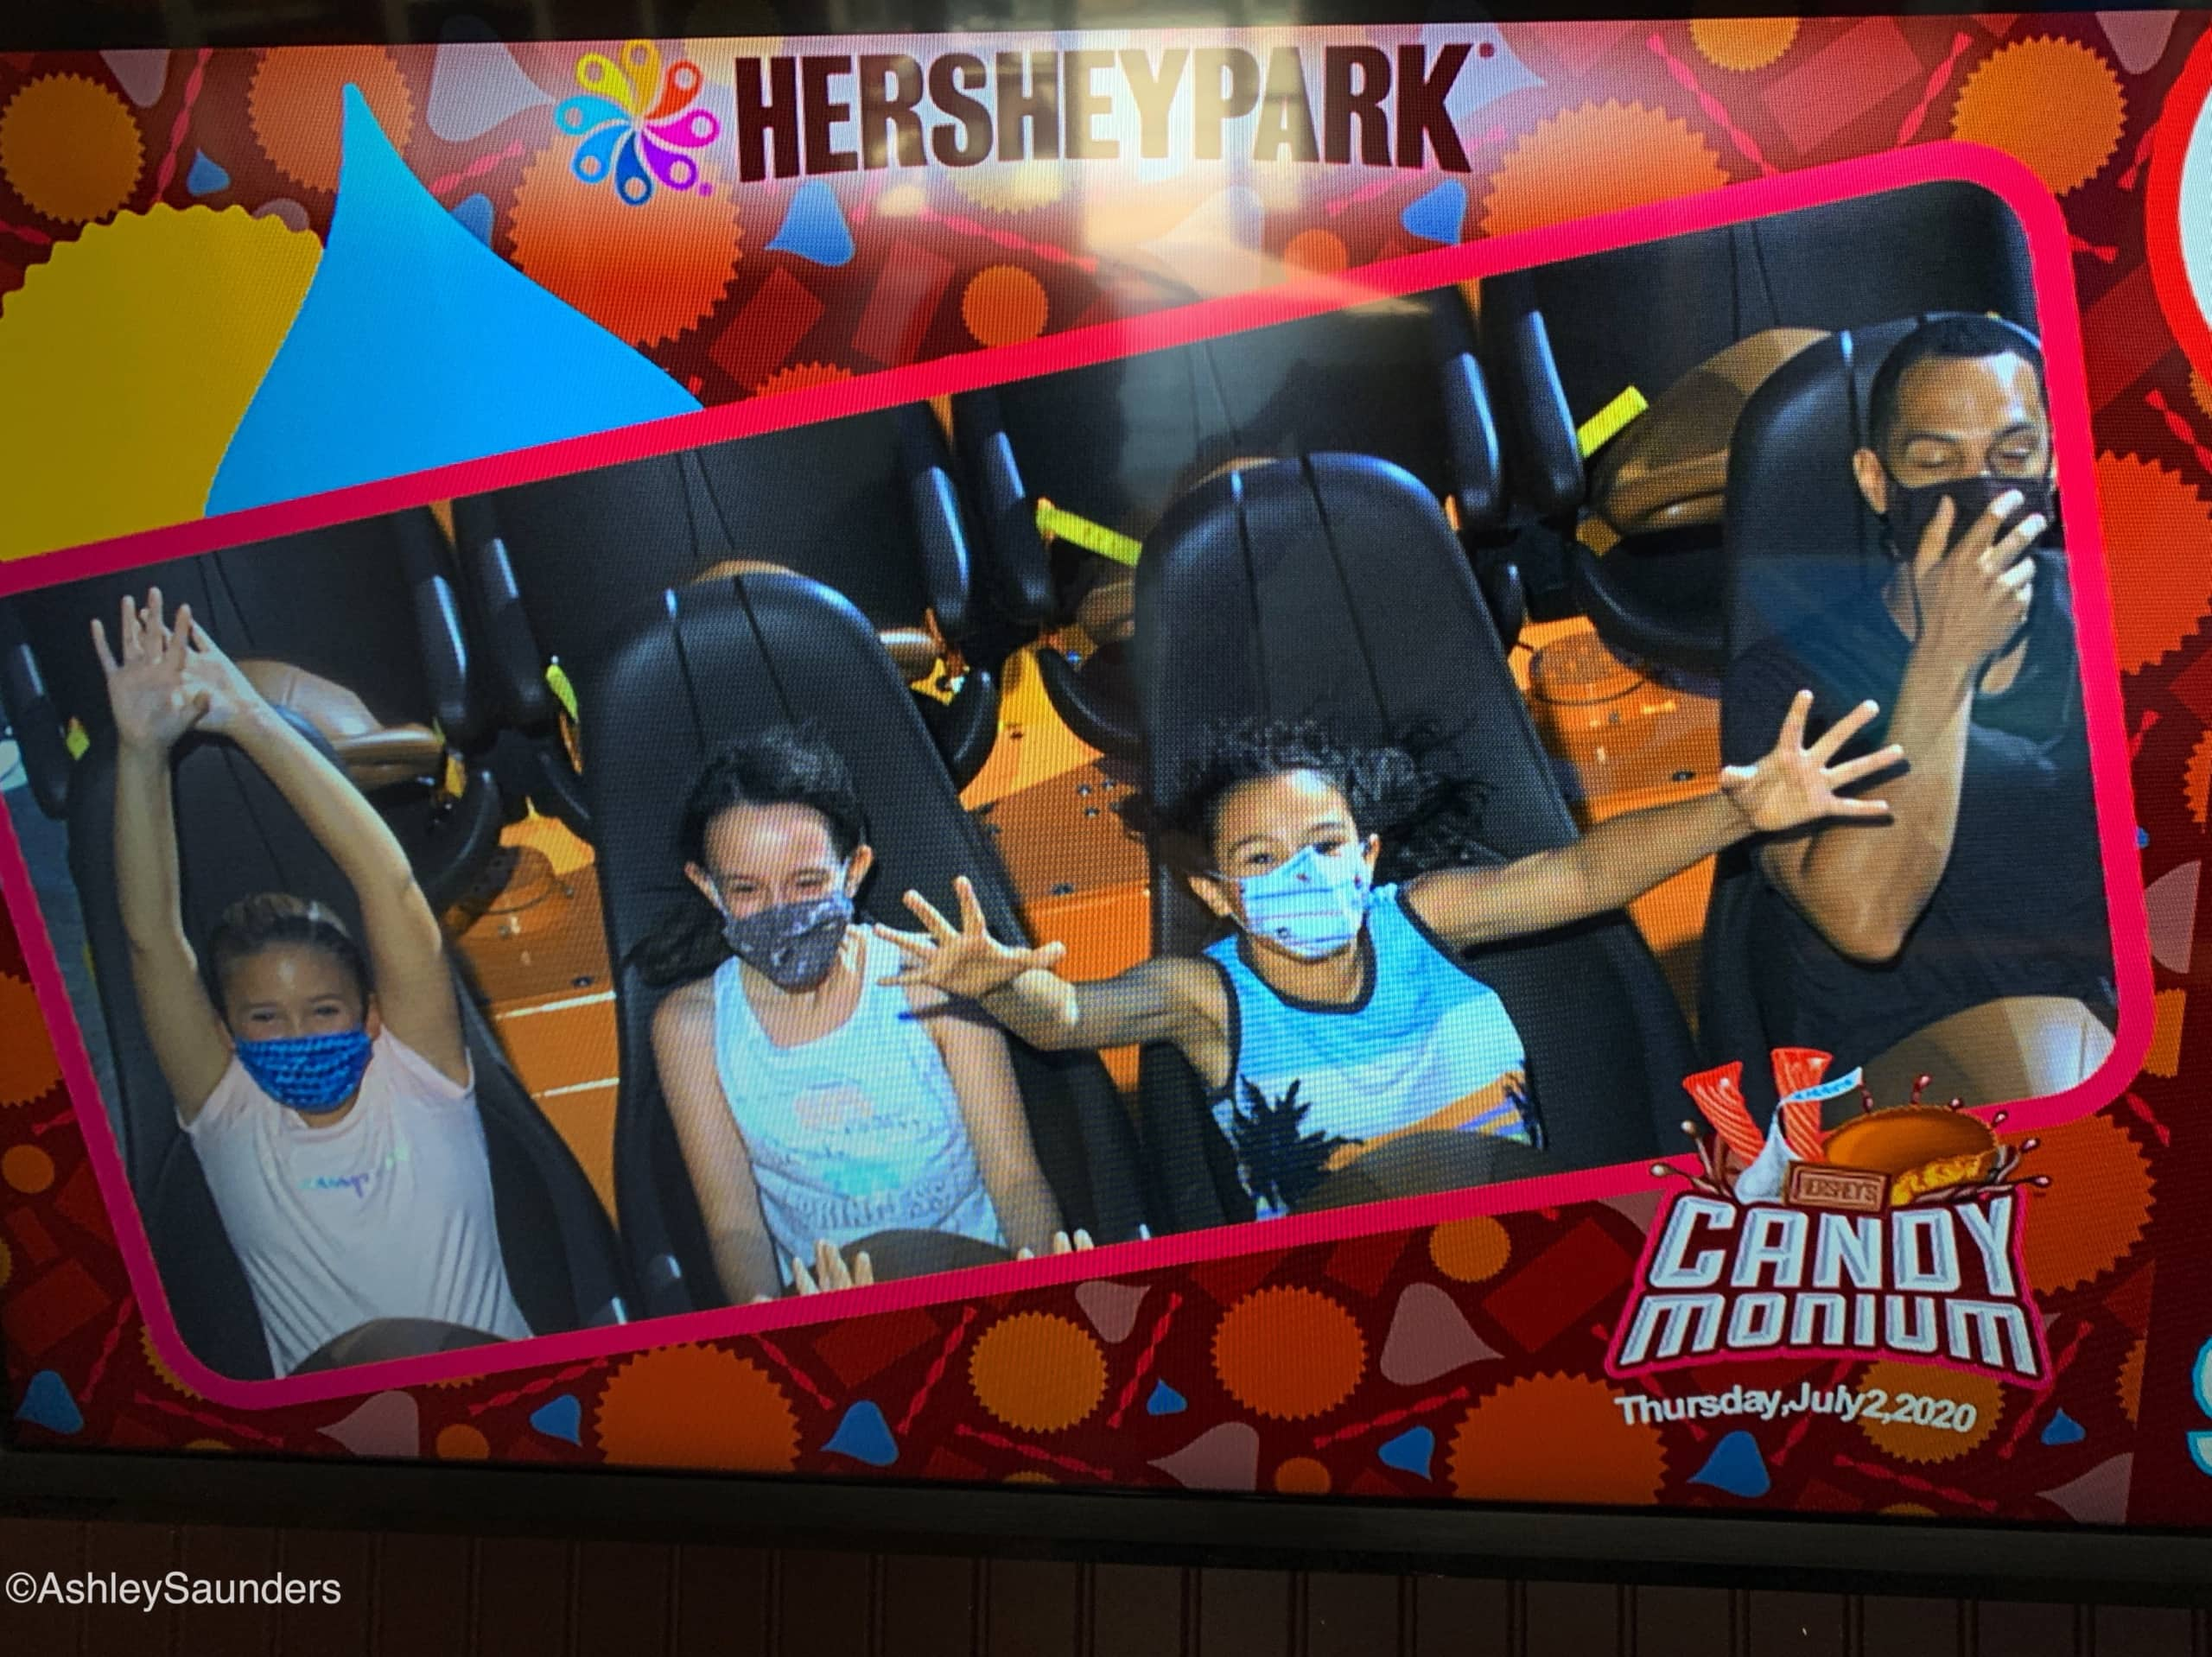 Visiting Hersheypark in 2020 Masks